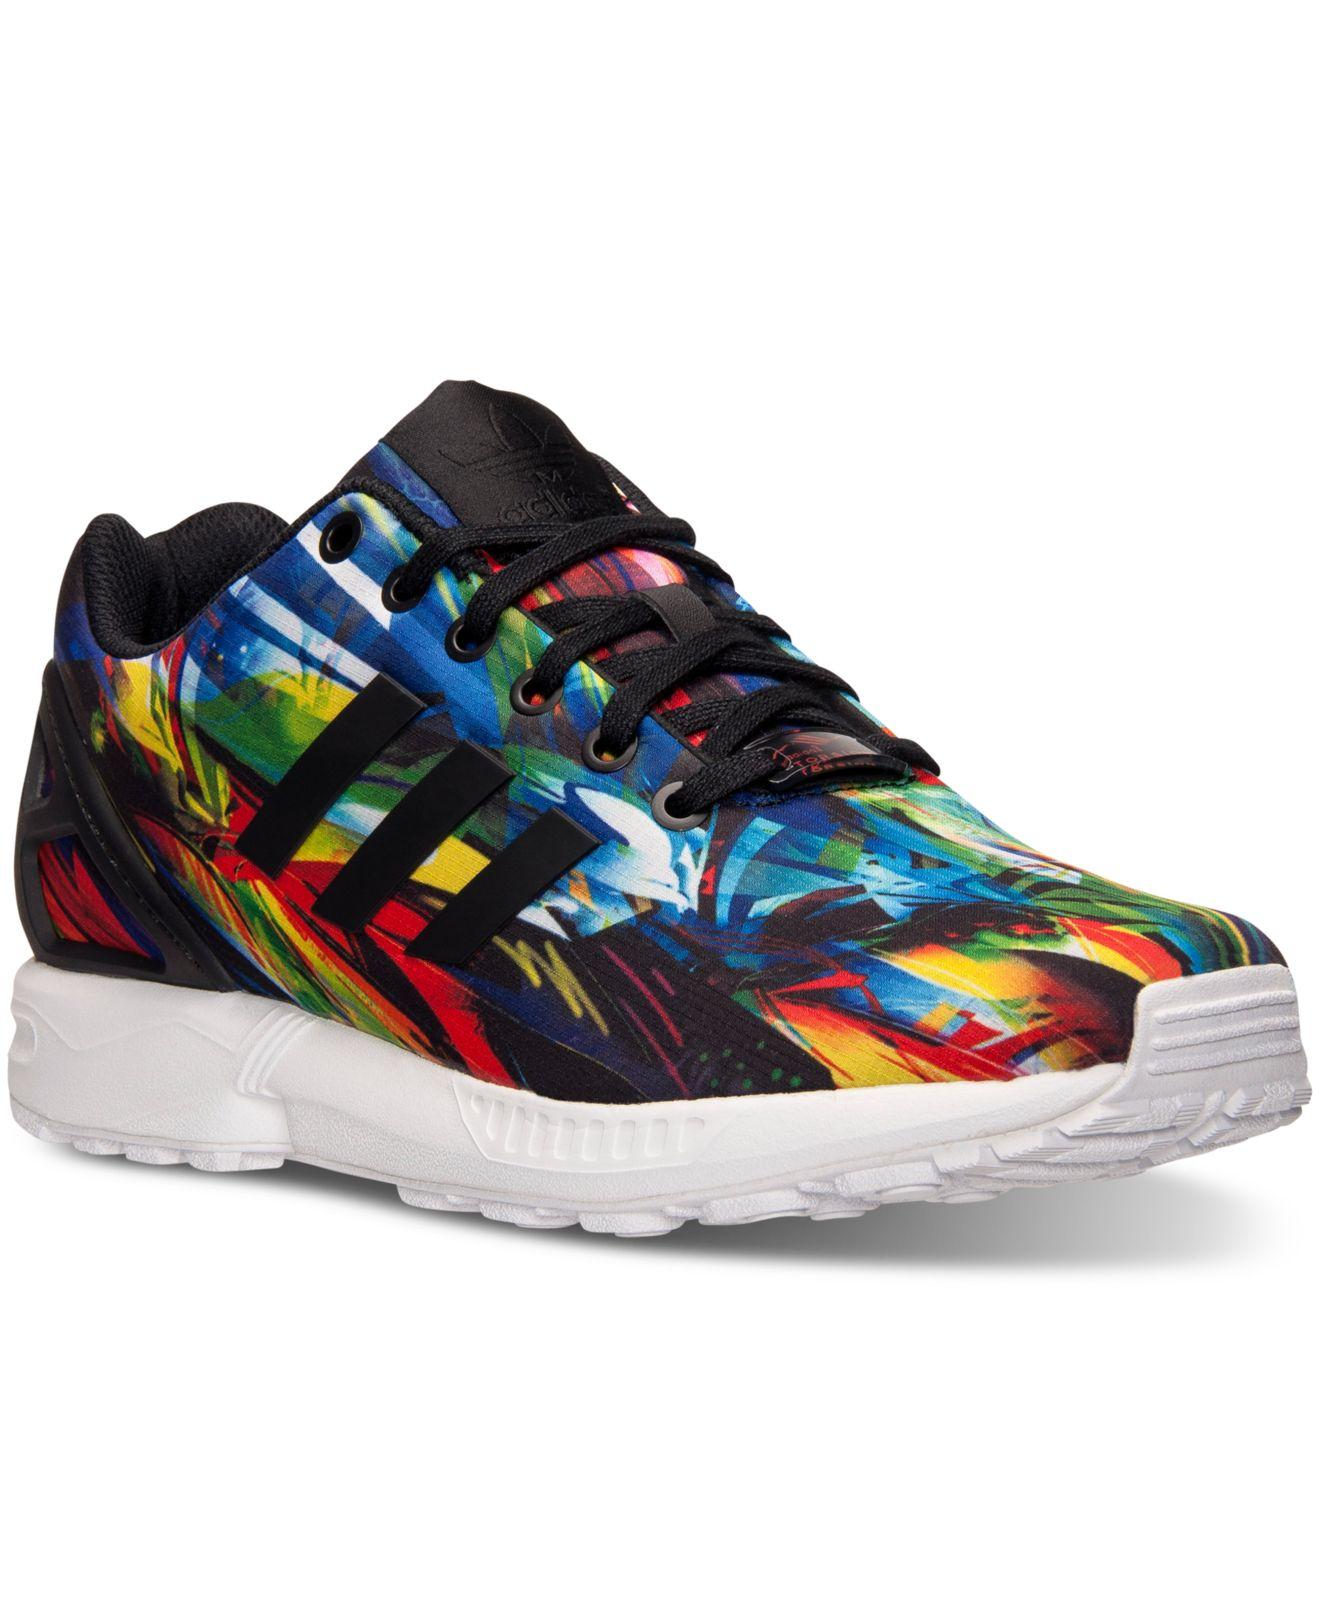 Adidas High Heel Running Shoes